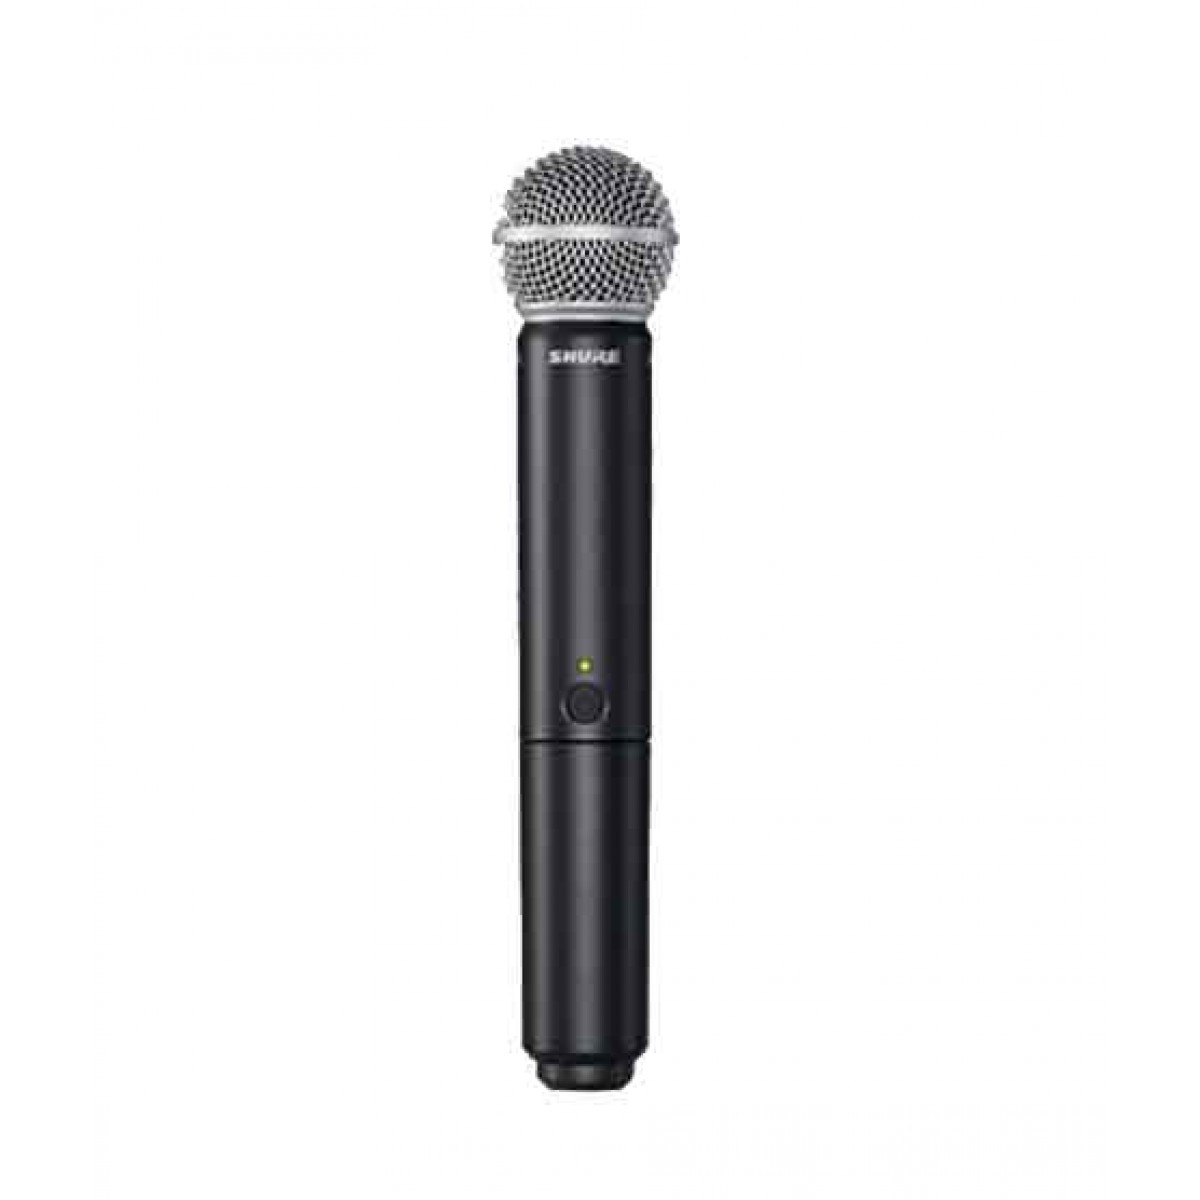 Shure Handheld Wireless Microphone Transmitter (BLX2/SM58)